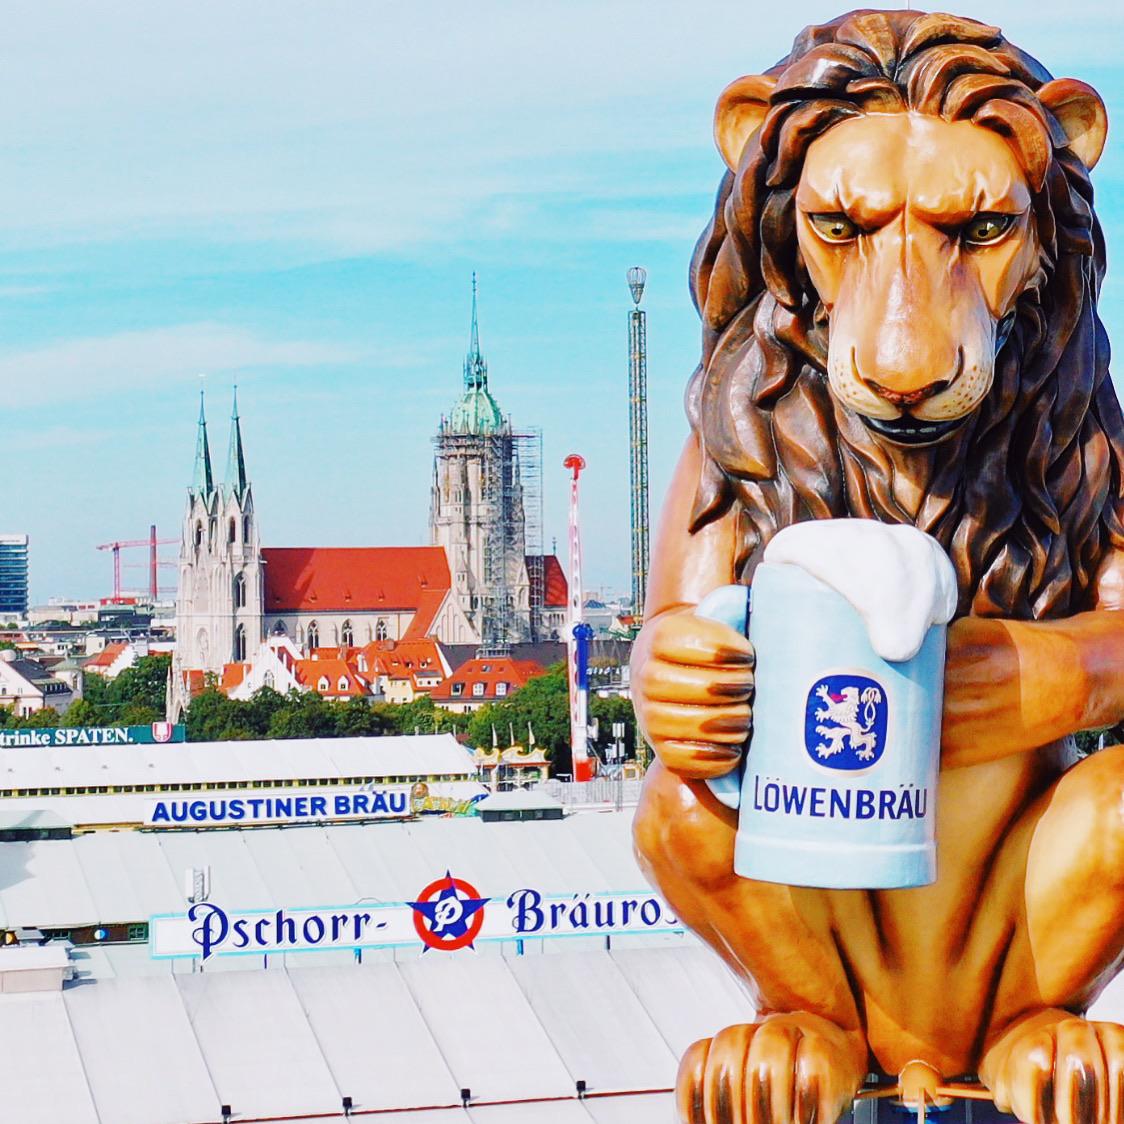 Die Wiesn - Oktoberfest - Löwenbräu Festzelt